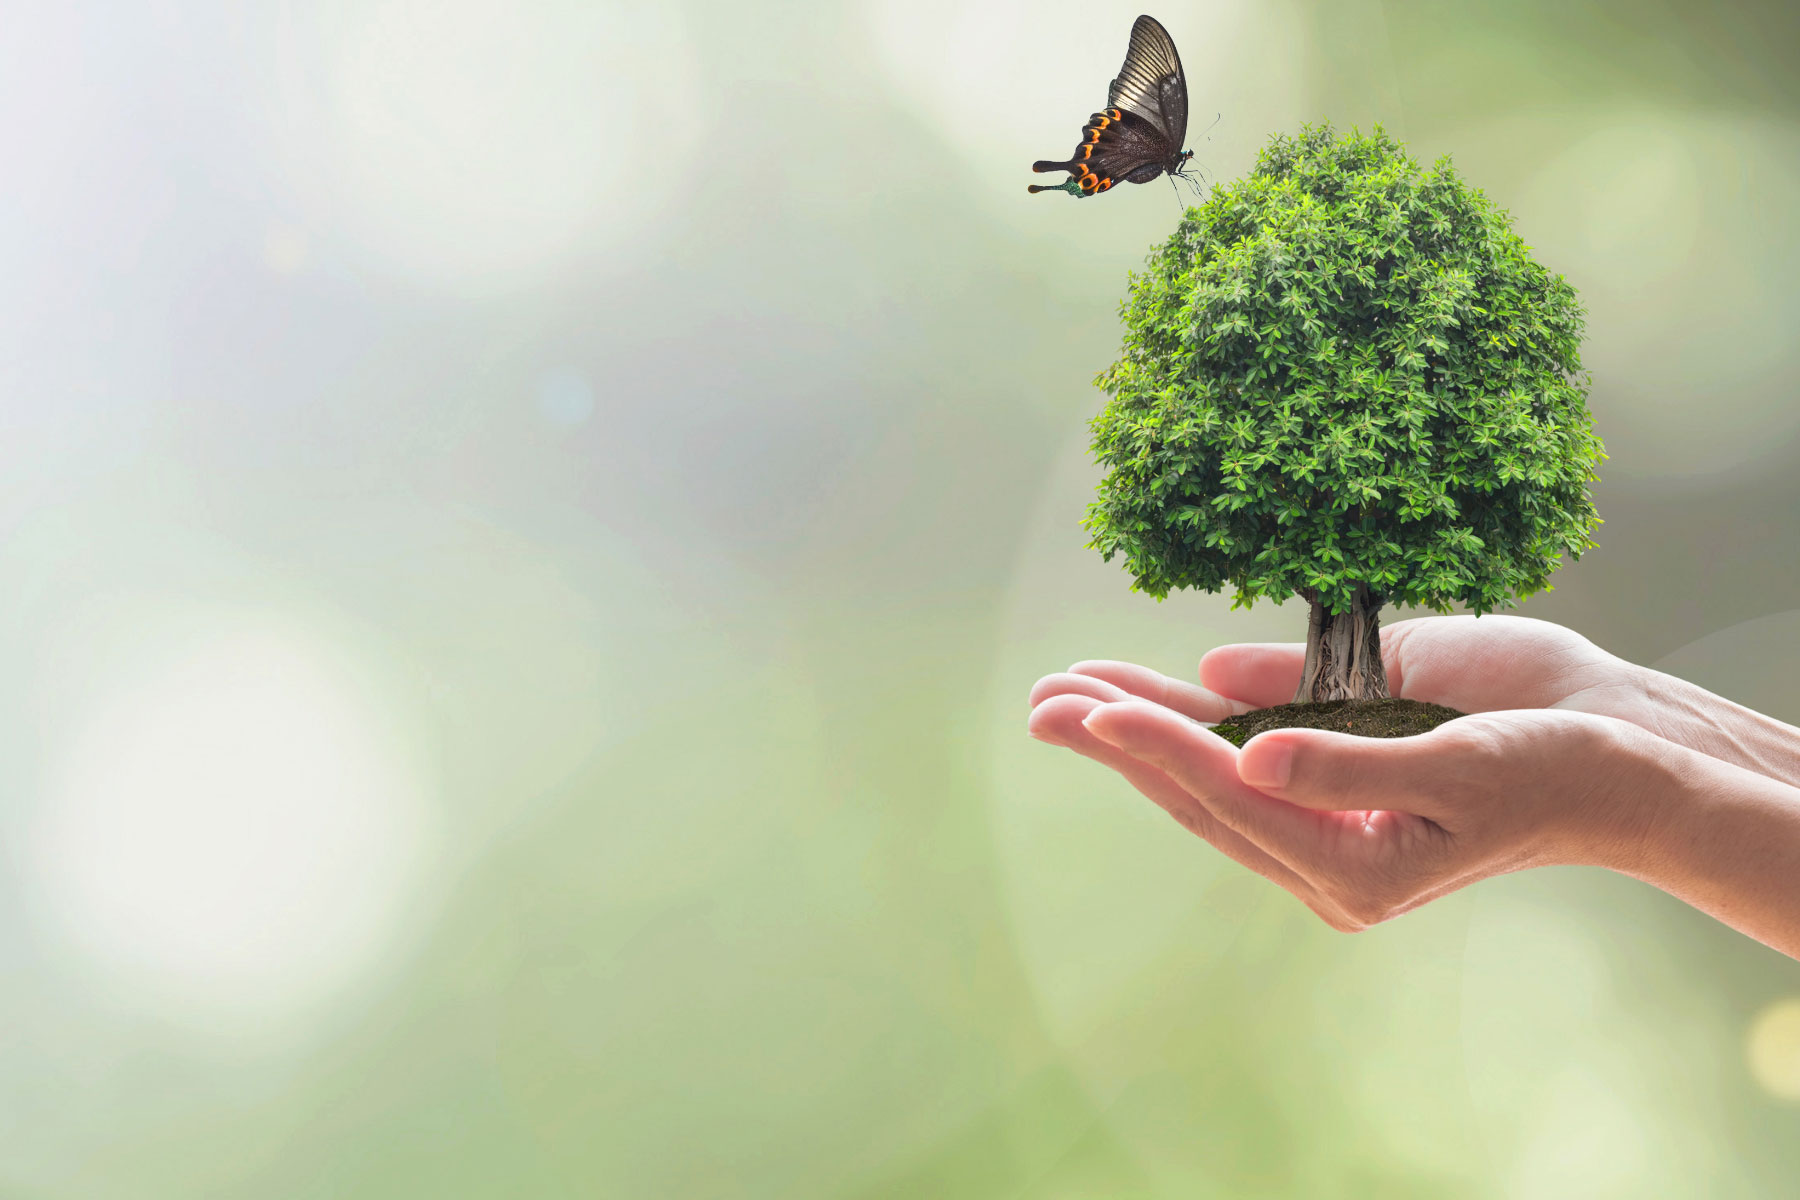 10 years of impact: keeping living things healthy